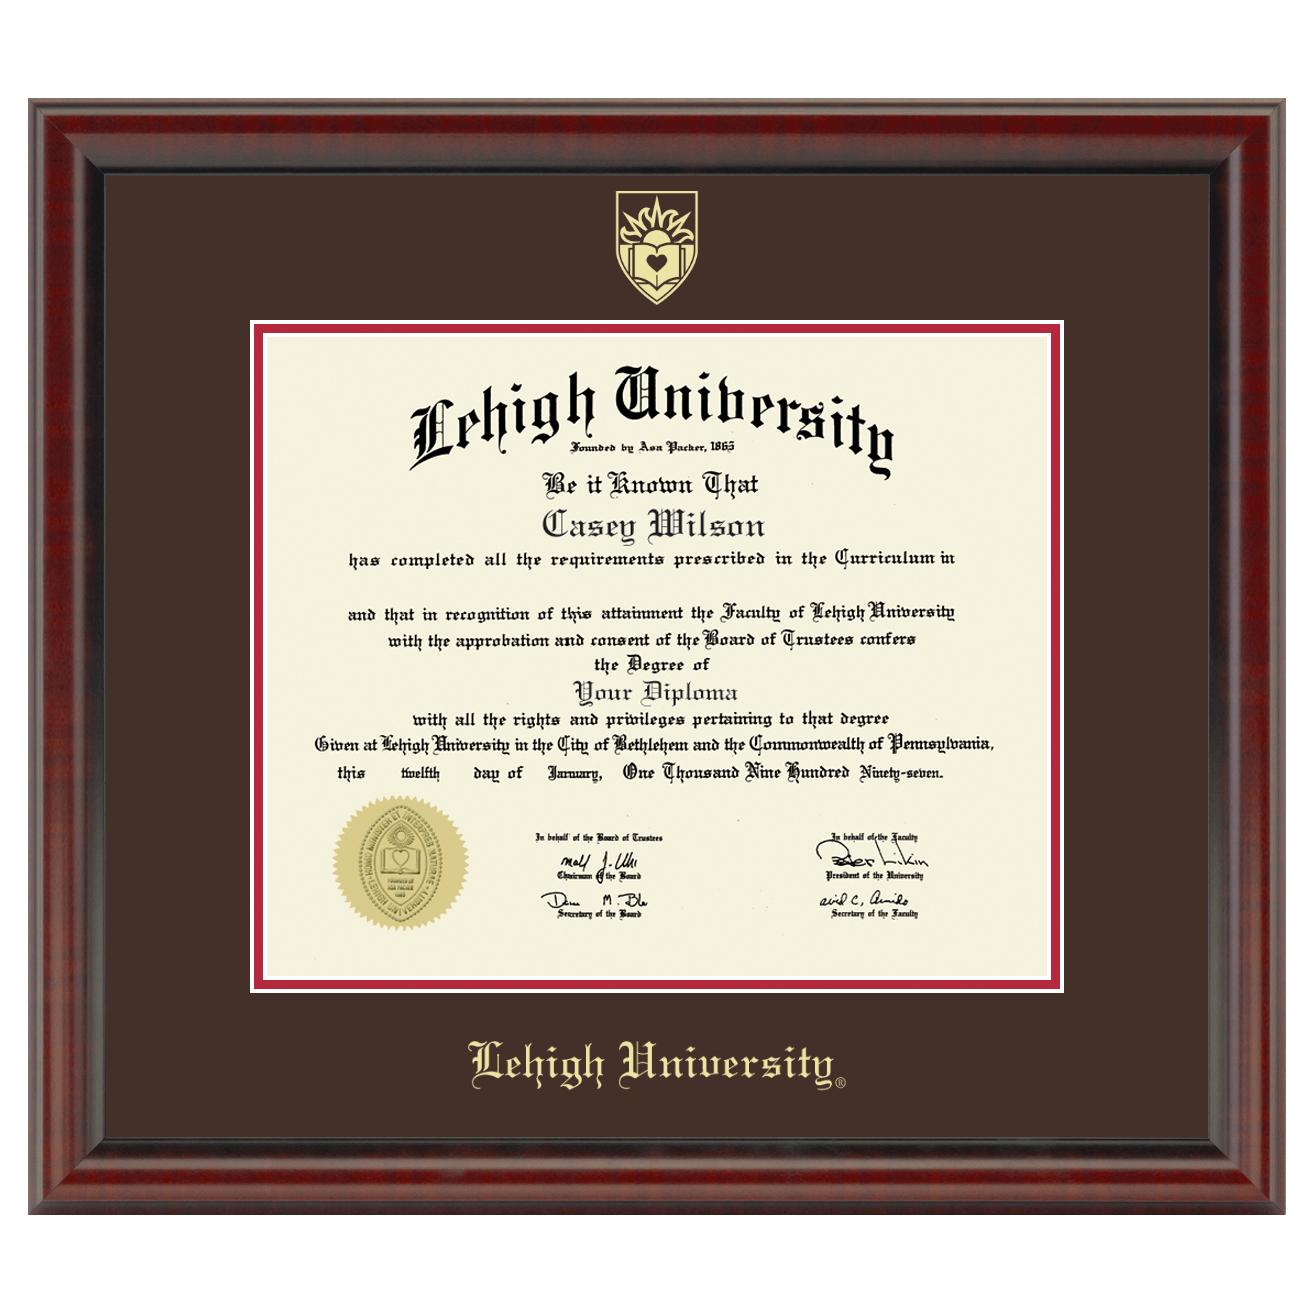 lehigh university diploma frame fidelitas graduation gift - Diploma Frames